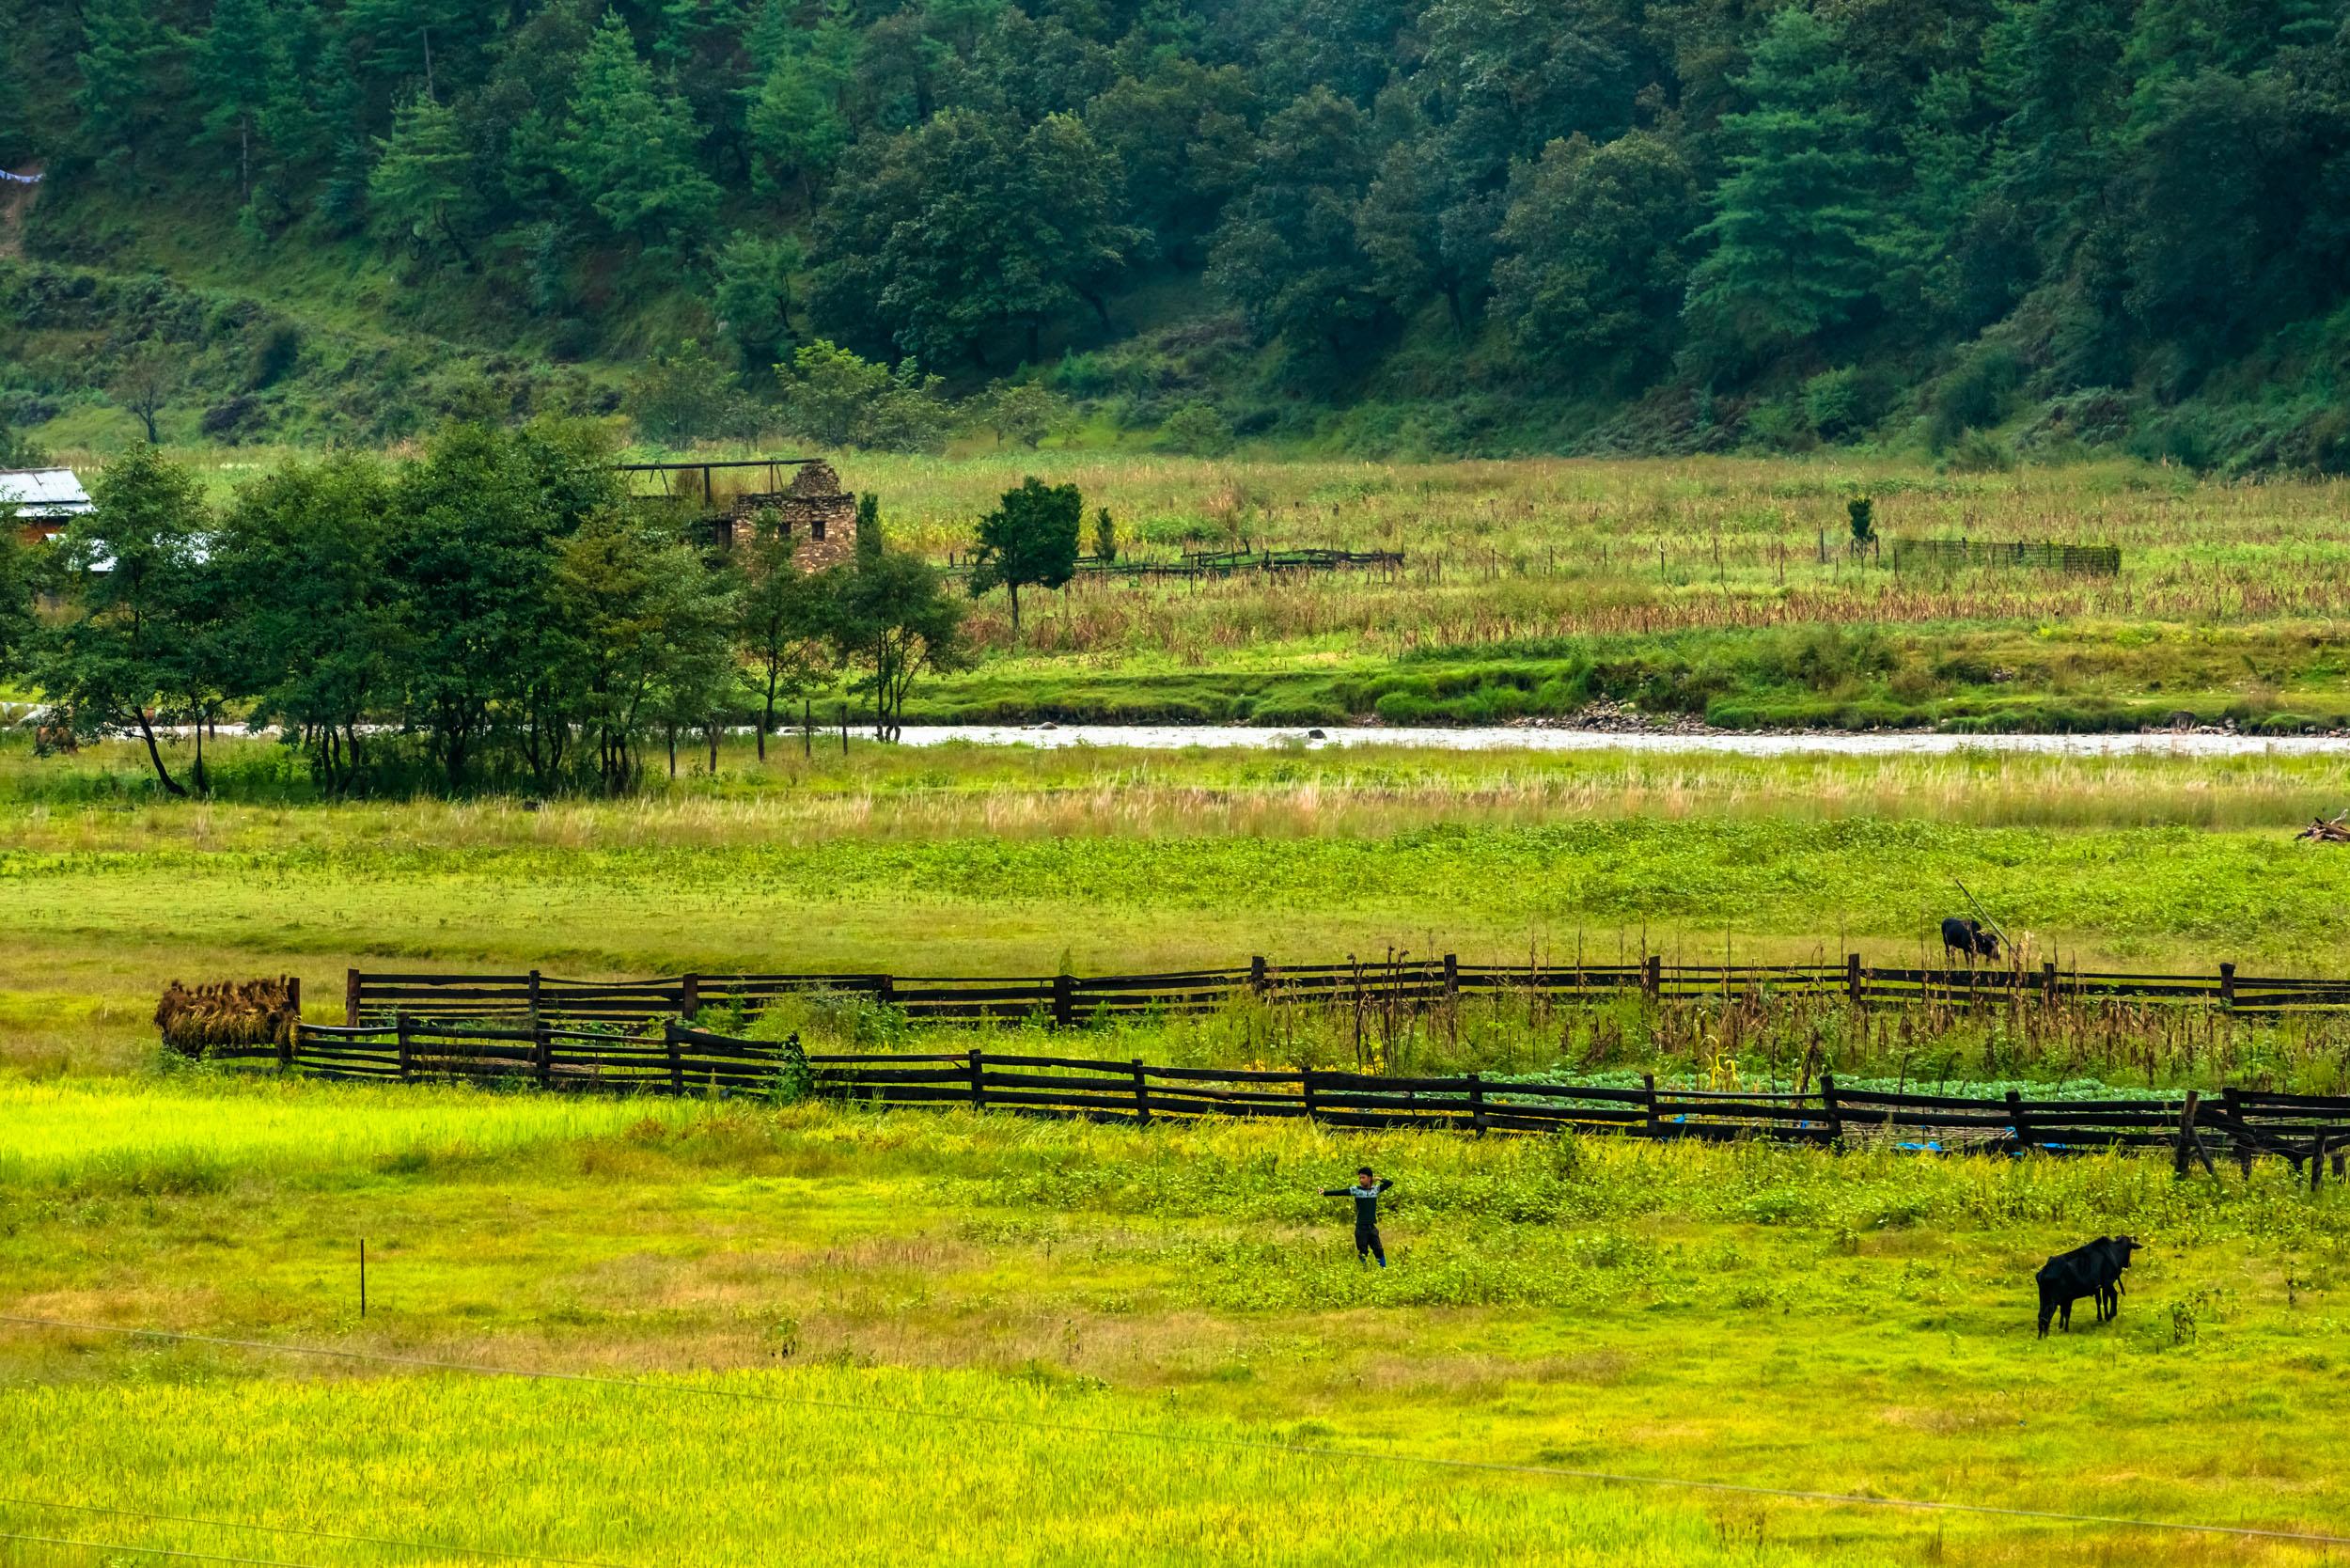 Wooden Cattle Enclosure